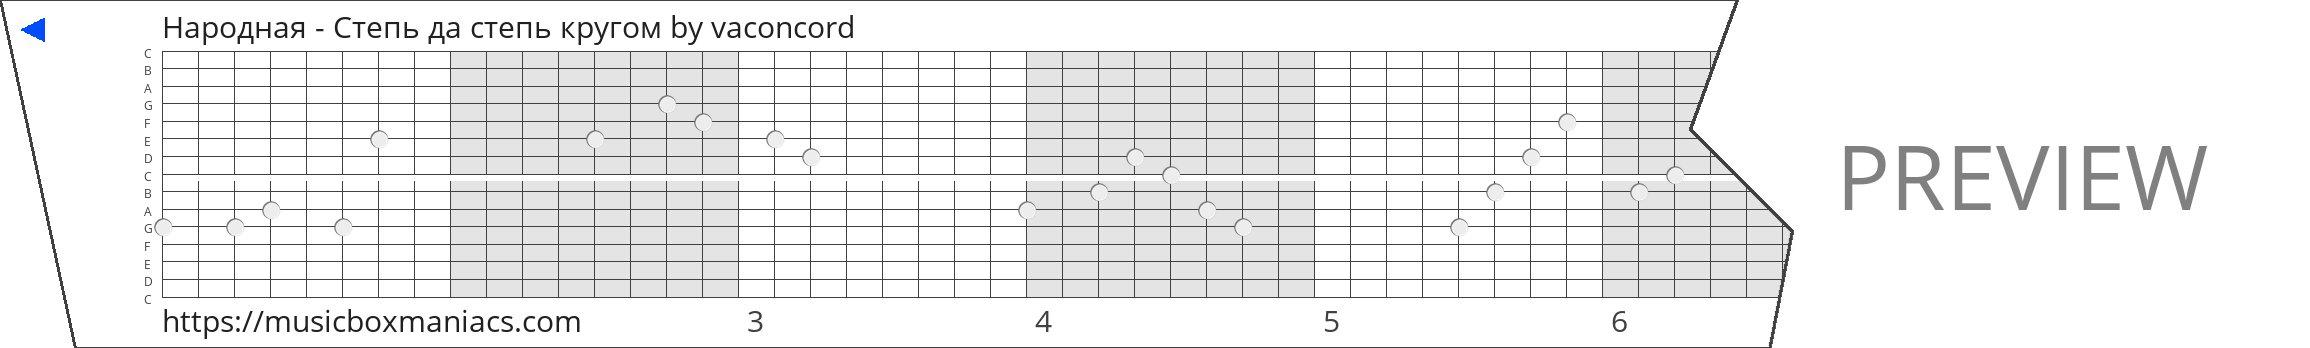 Народная - Степь да степь кругом 15 note music box paper strip